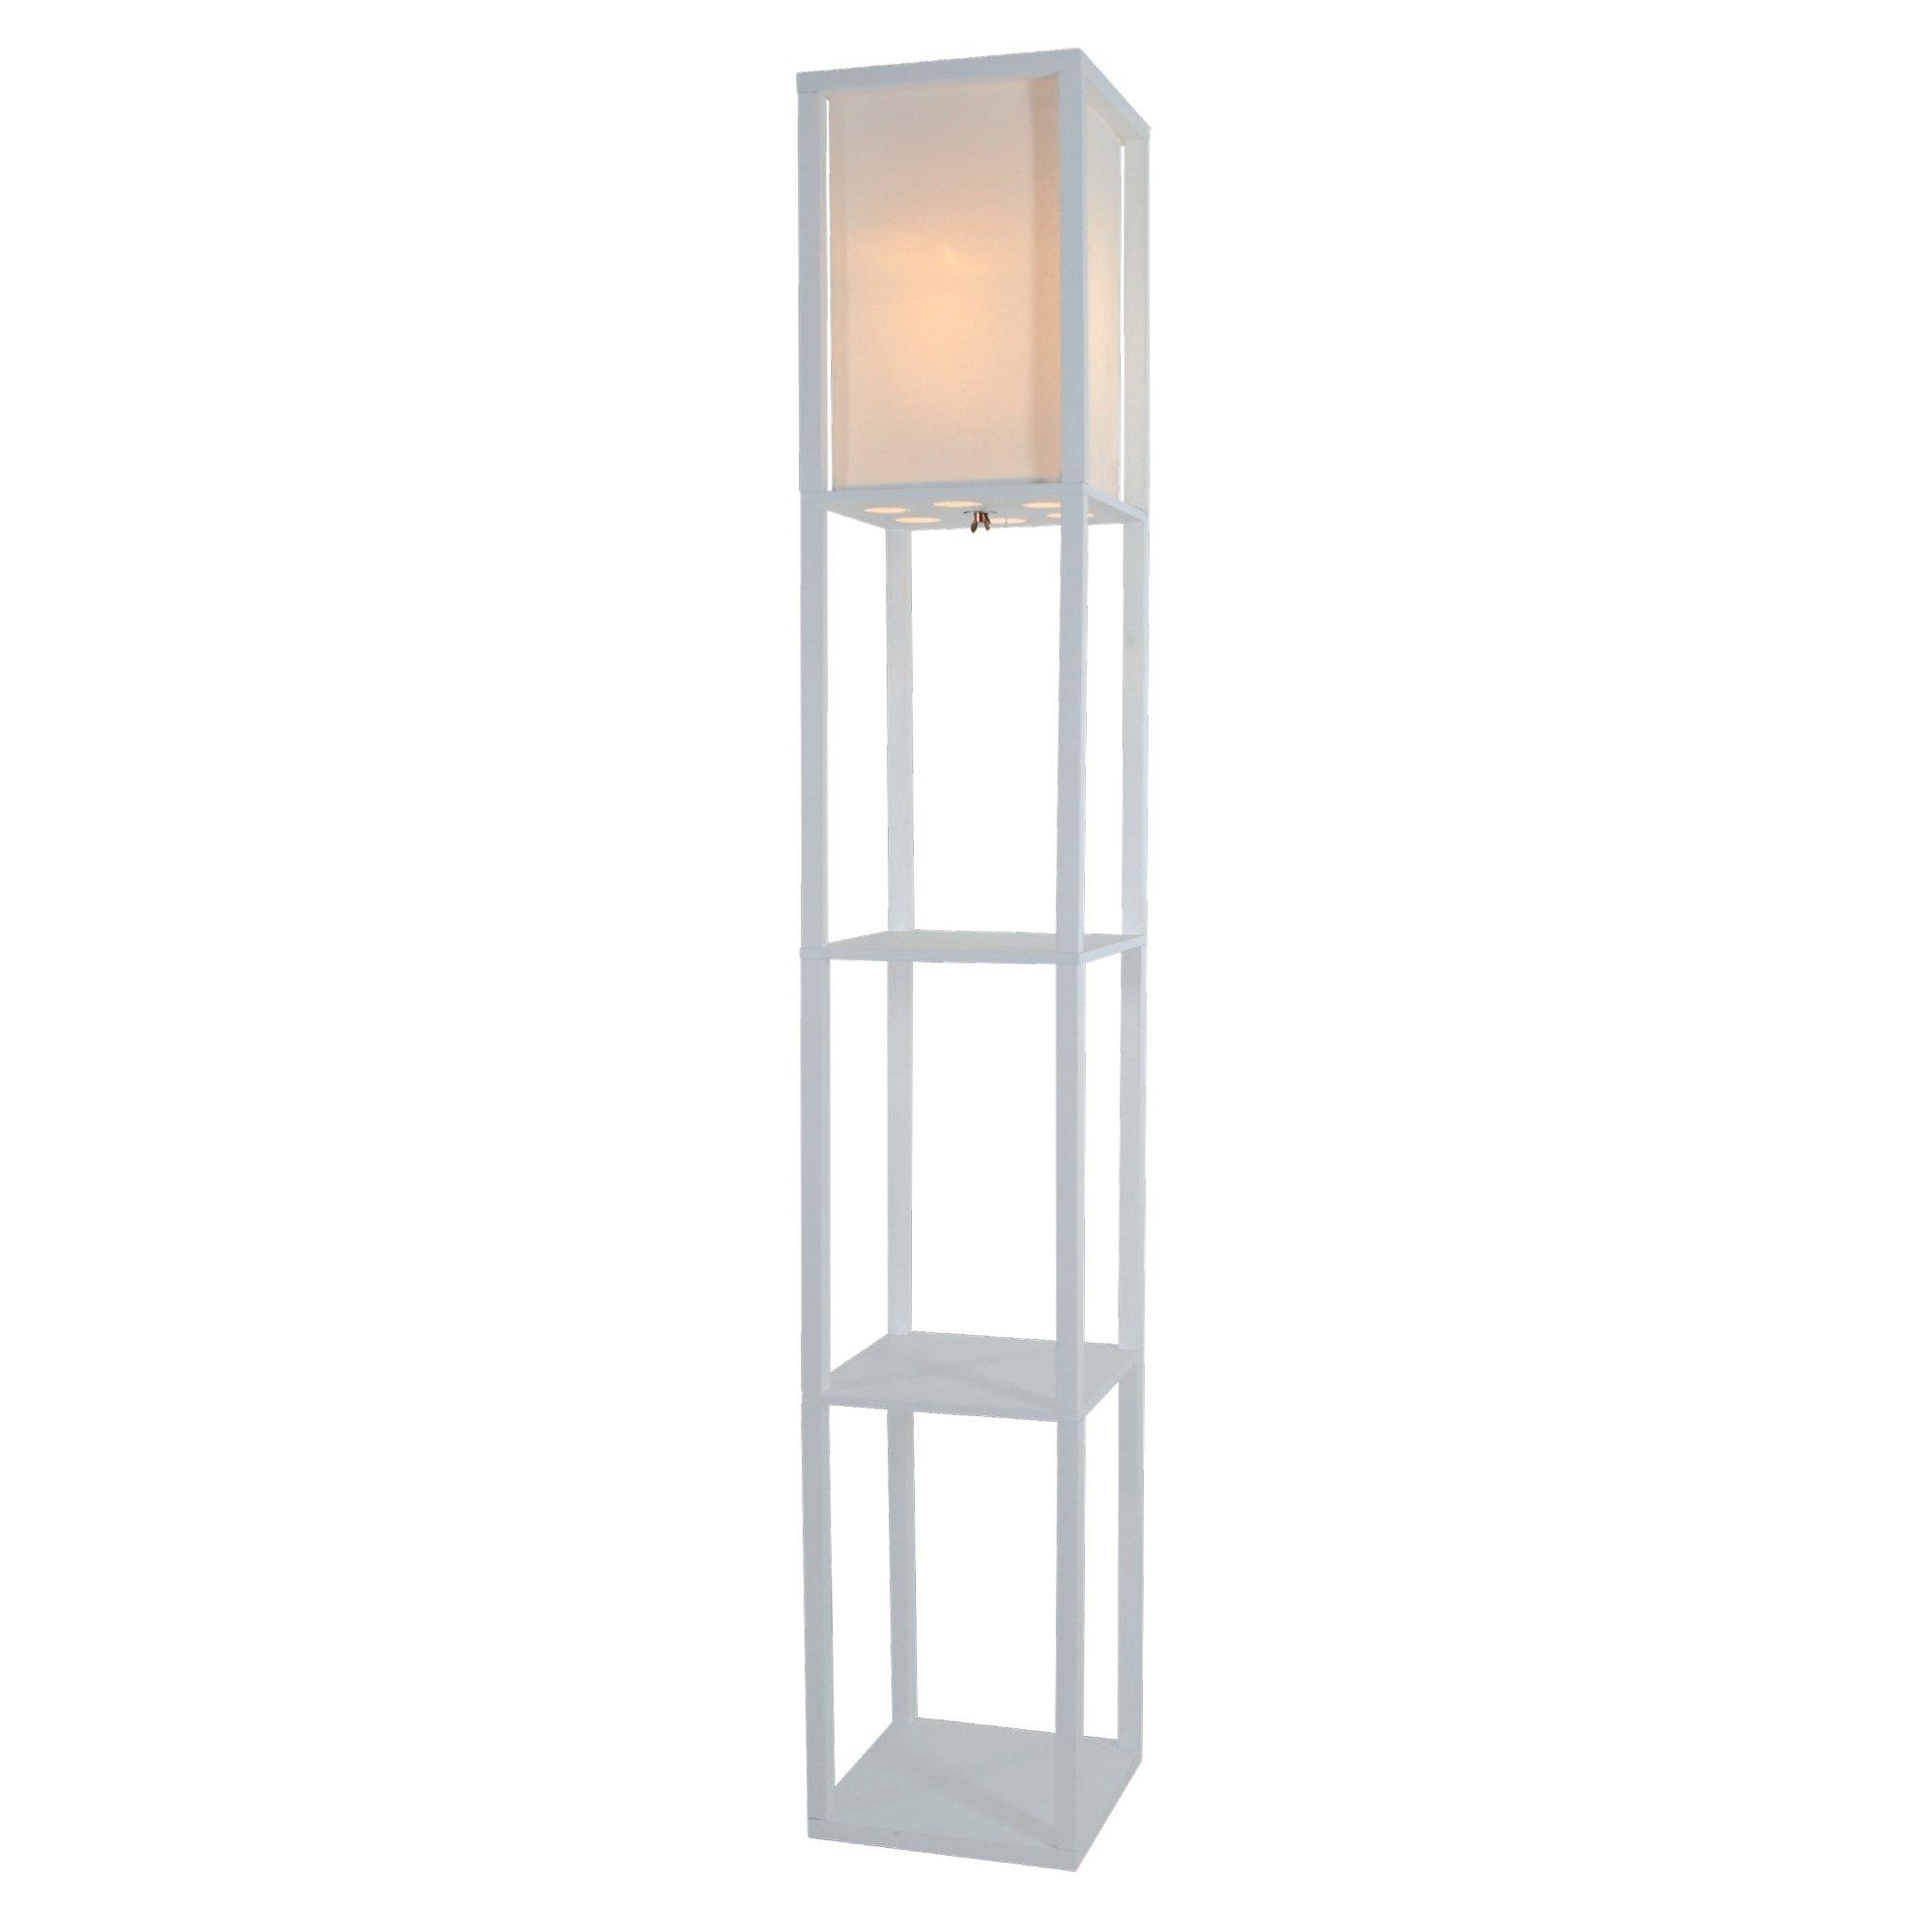 Nursery floor lamp amazon light accents wooden floor lamp with white linen shade white aloadofball Choice Image